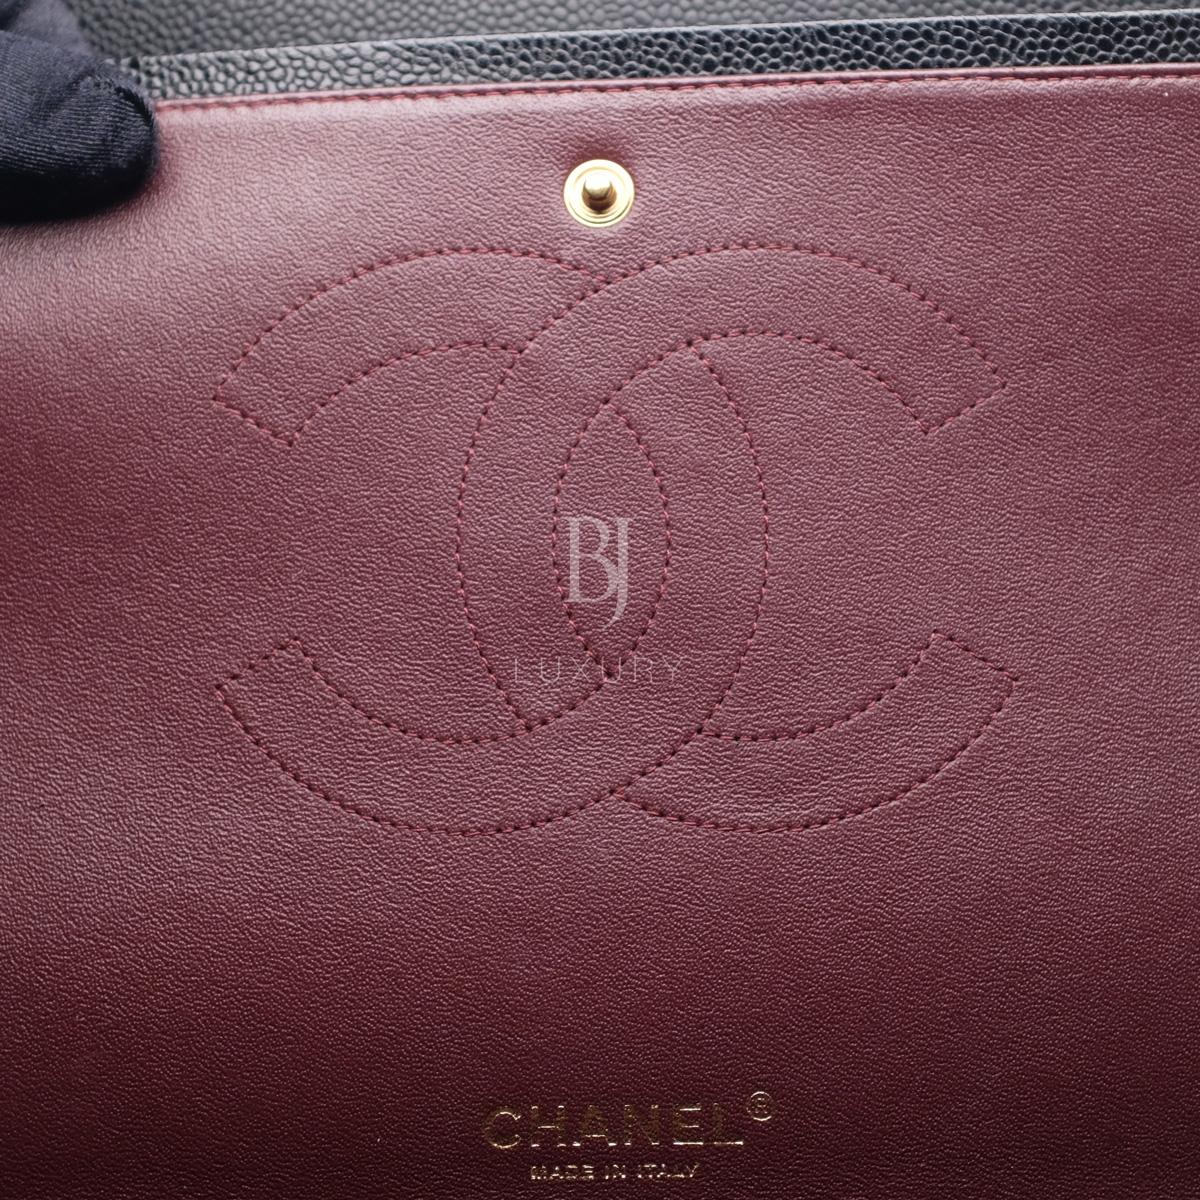 Chanel Classic Handbag Caviar Maxi Black BJ Luxury 18.jpg